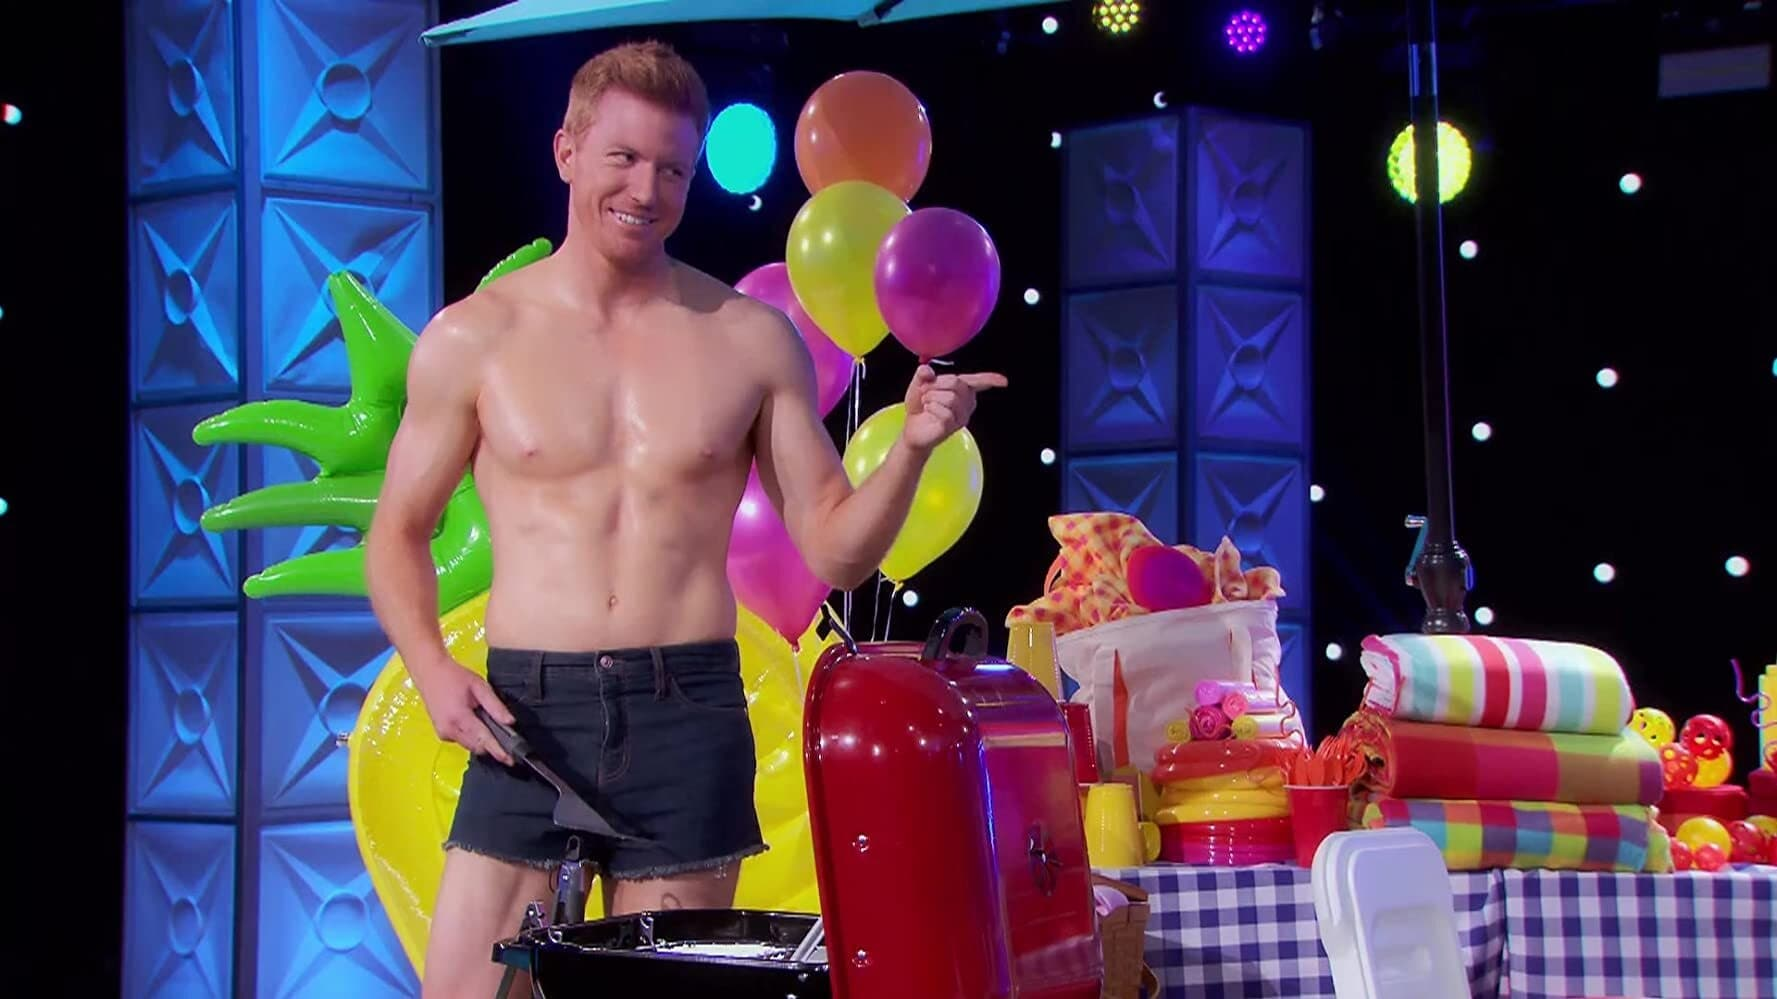 RuPaul's Drag Race All Stars - Season 5 Episode 6 : The Charles Family Backyard Ball